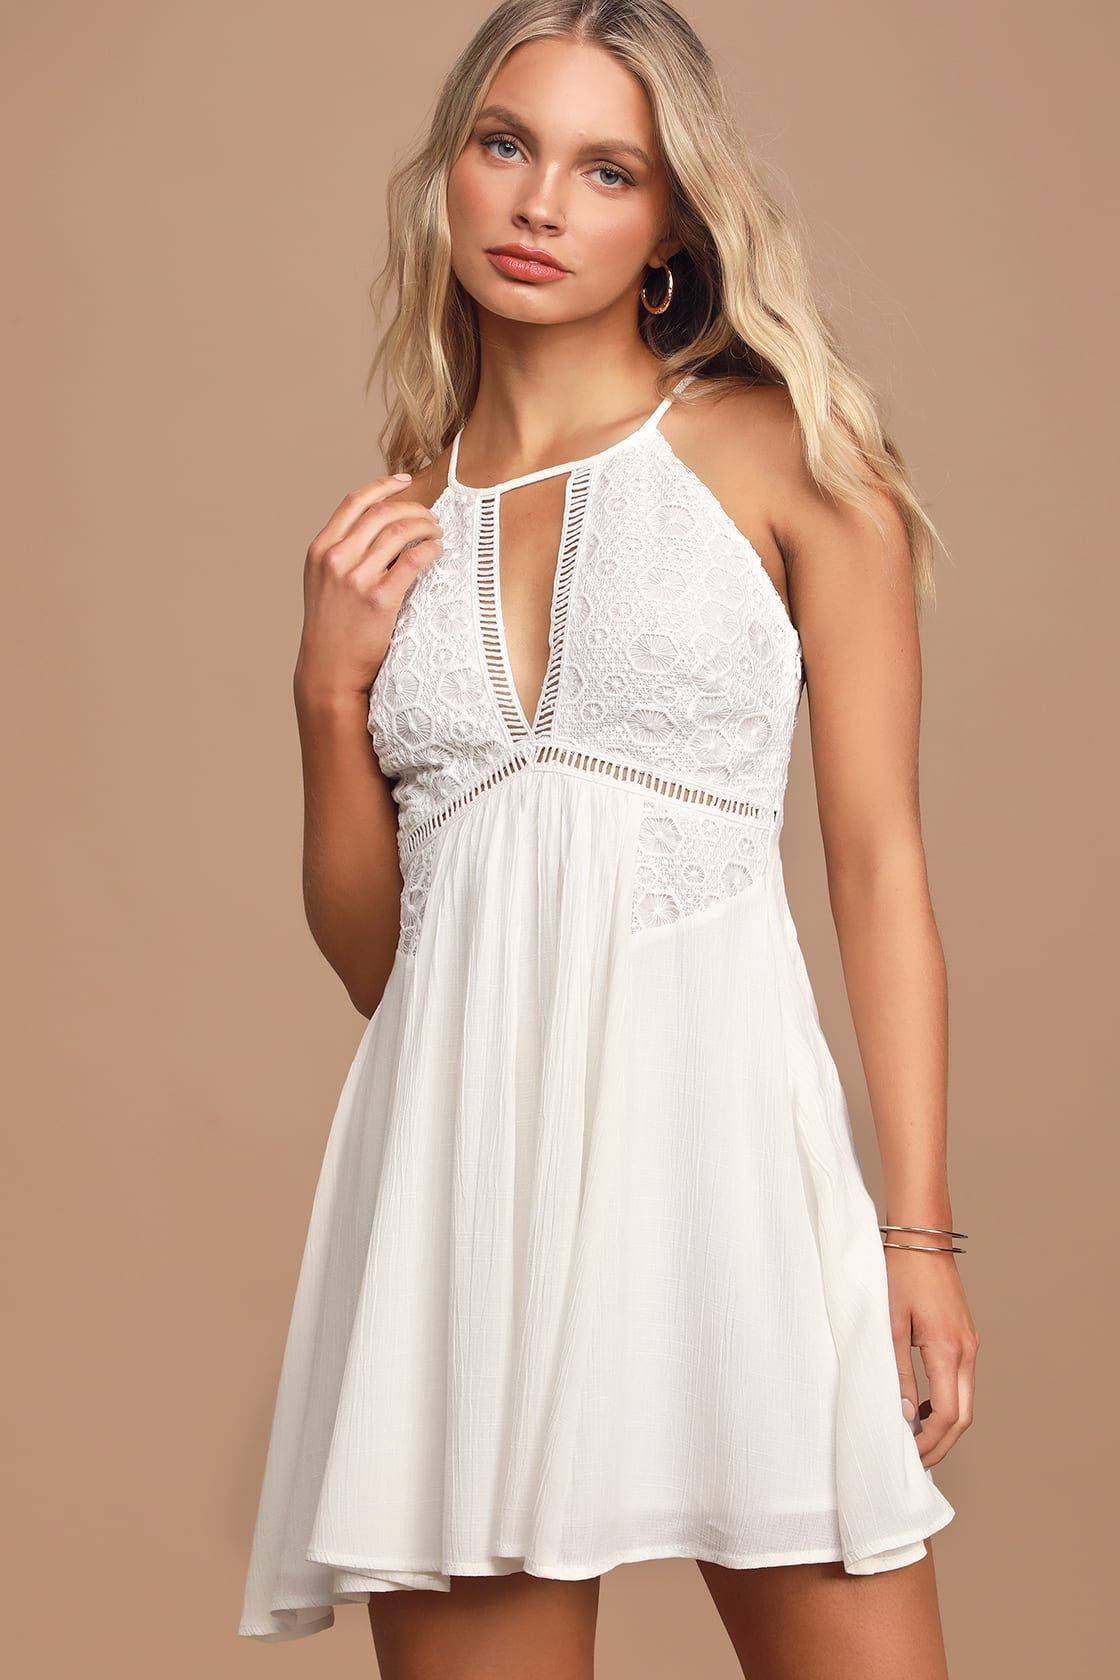 Whirlwind Summer White Crochet Lace Skater Dress Lace Skater Dress Casual Summer Dresses Sundresses Cute White Dress [ 1680 x 1120 Pixel ]